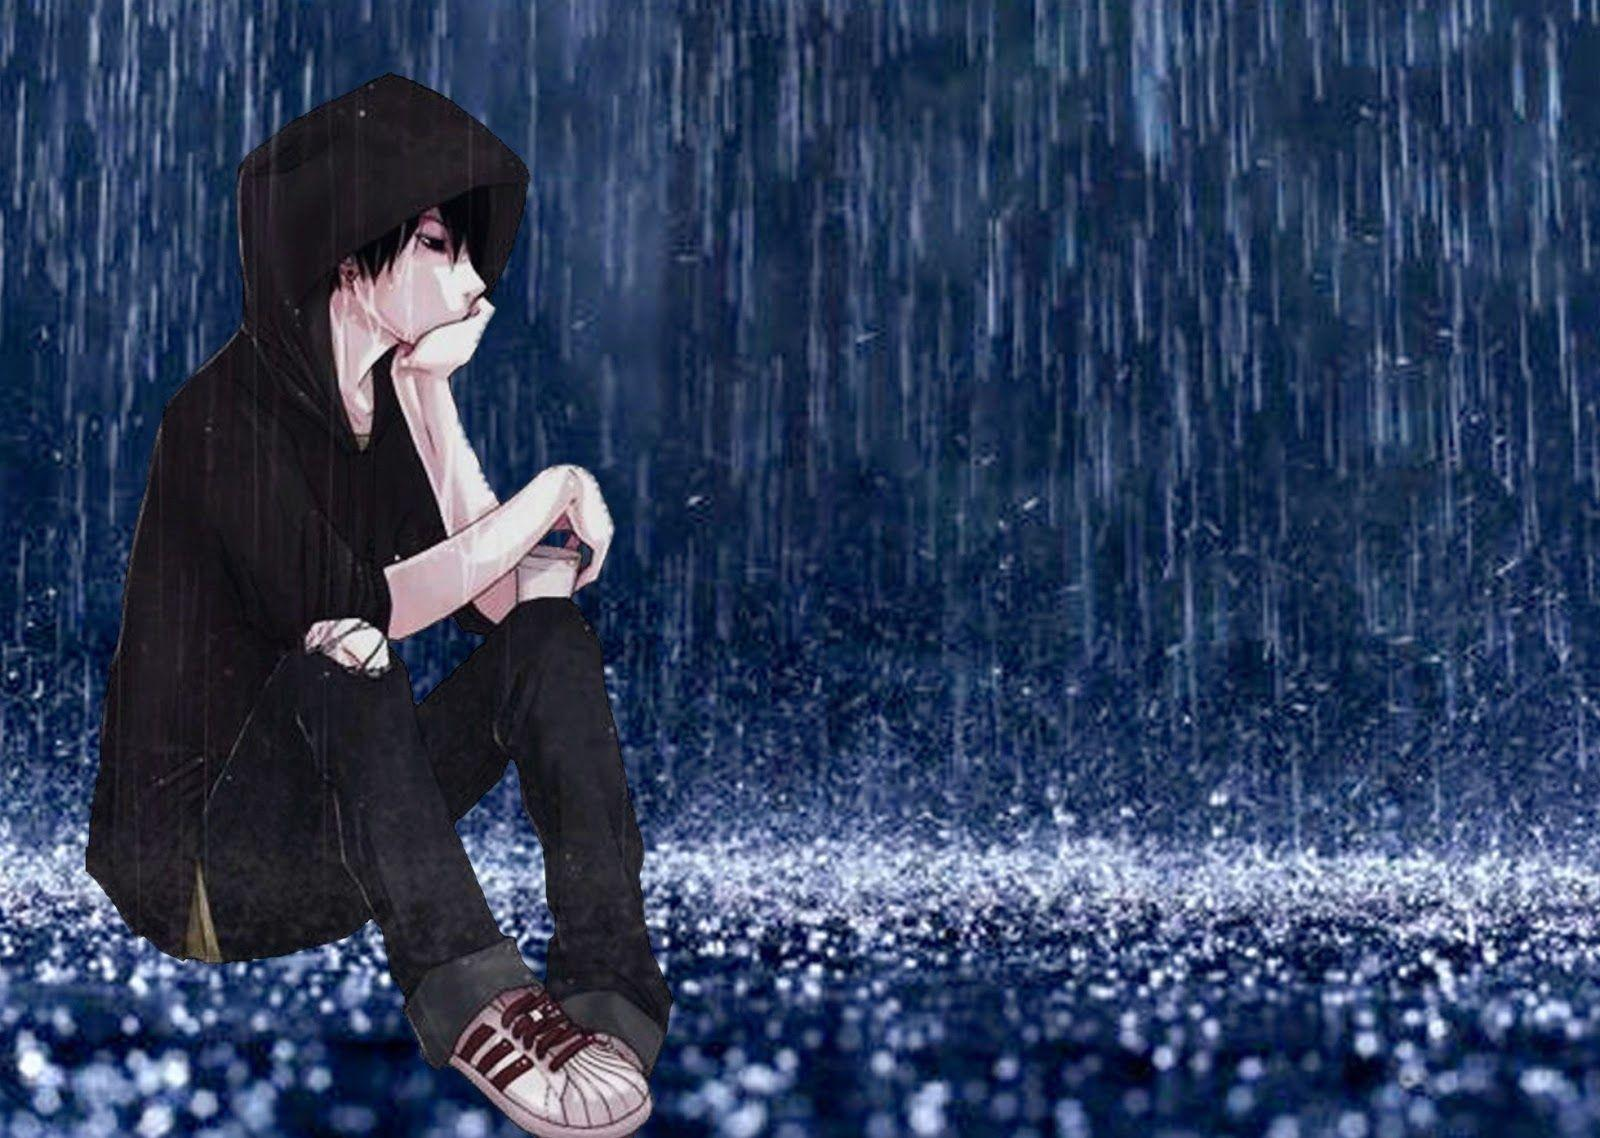 Sad Boy Alone In Rain Wallpapers - Wallpaper Cave